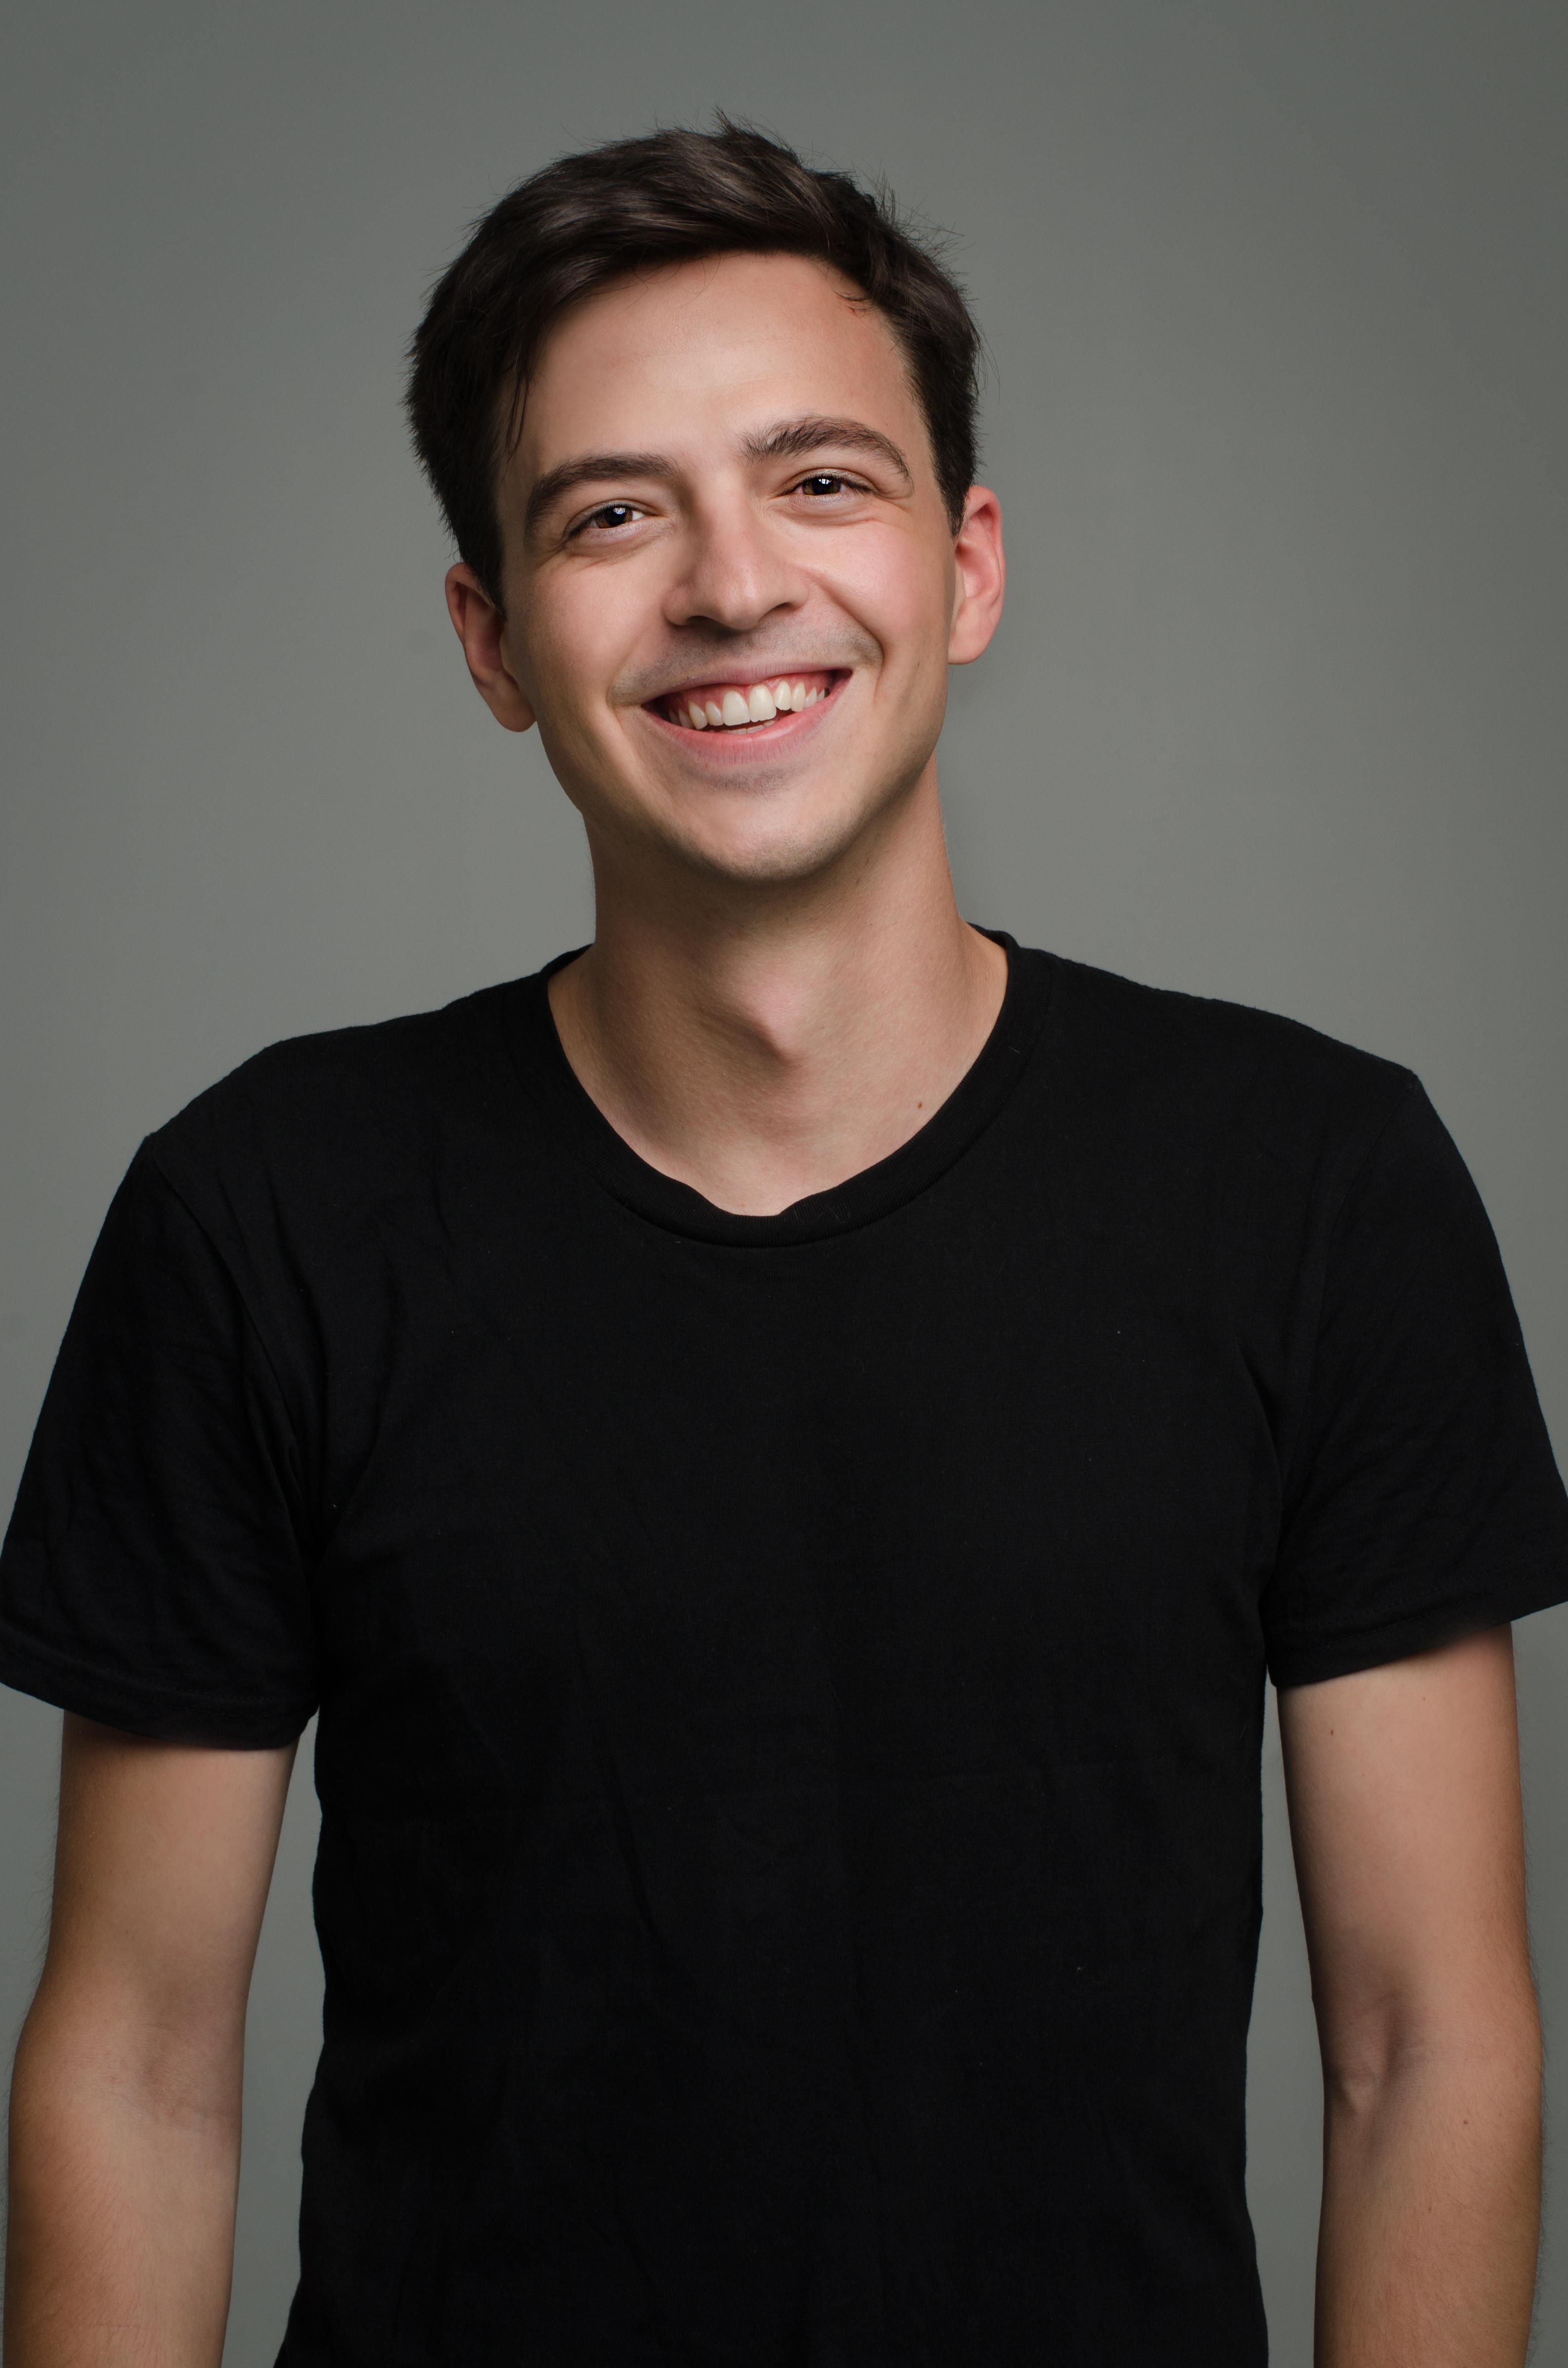 Nathan Murphy